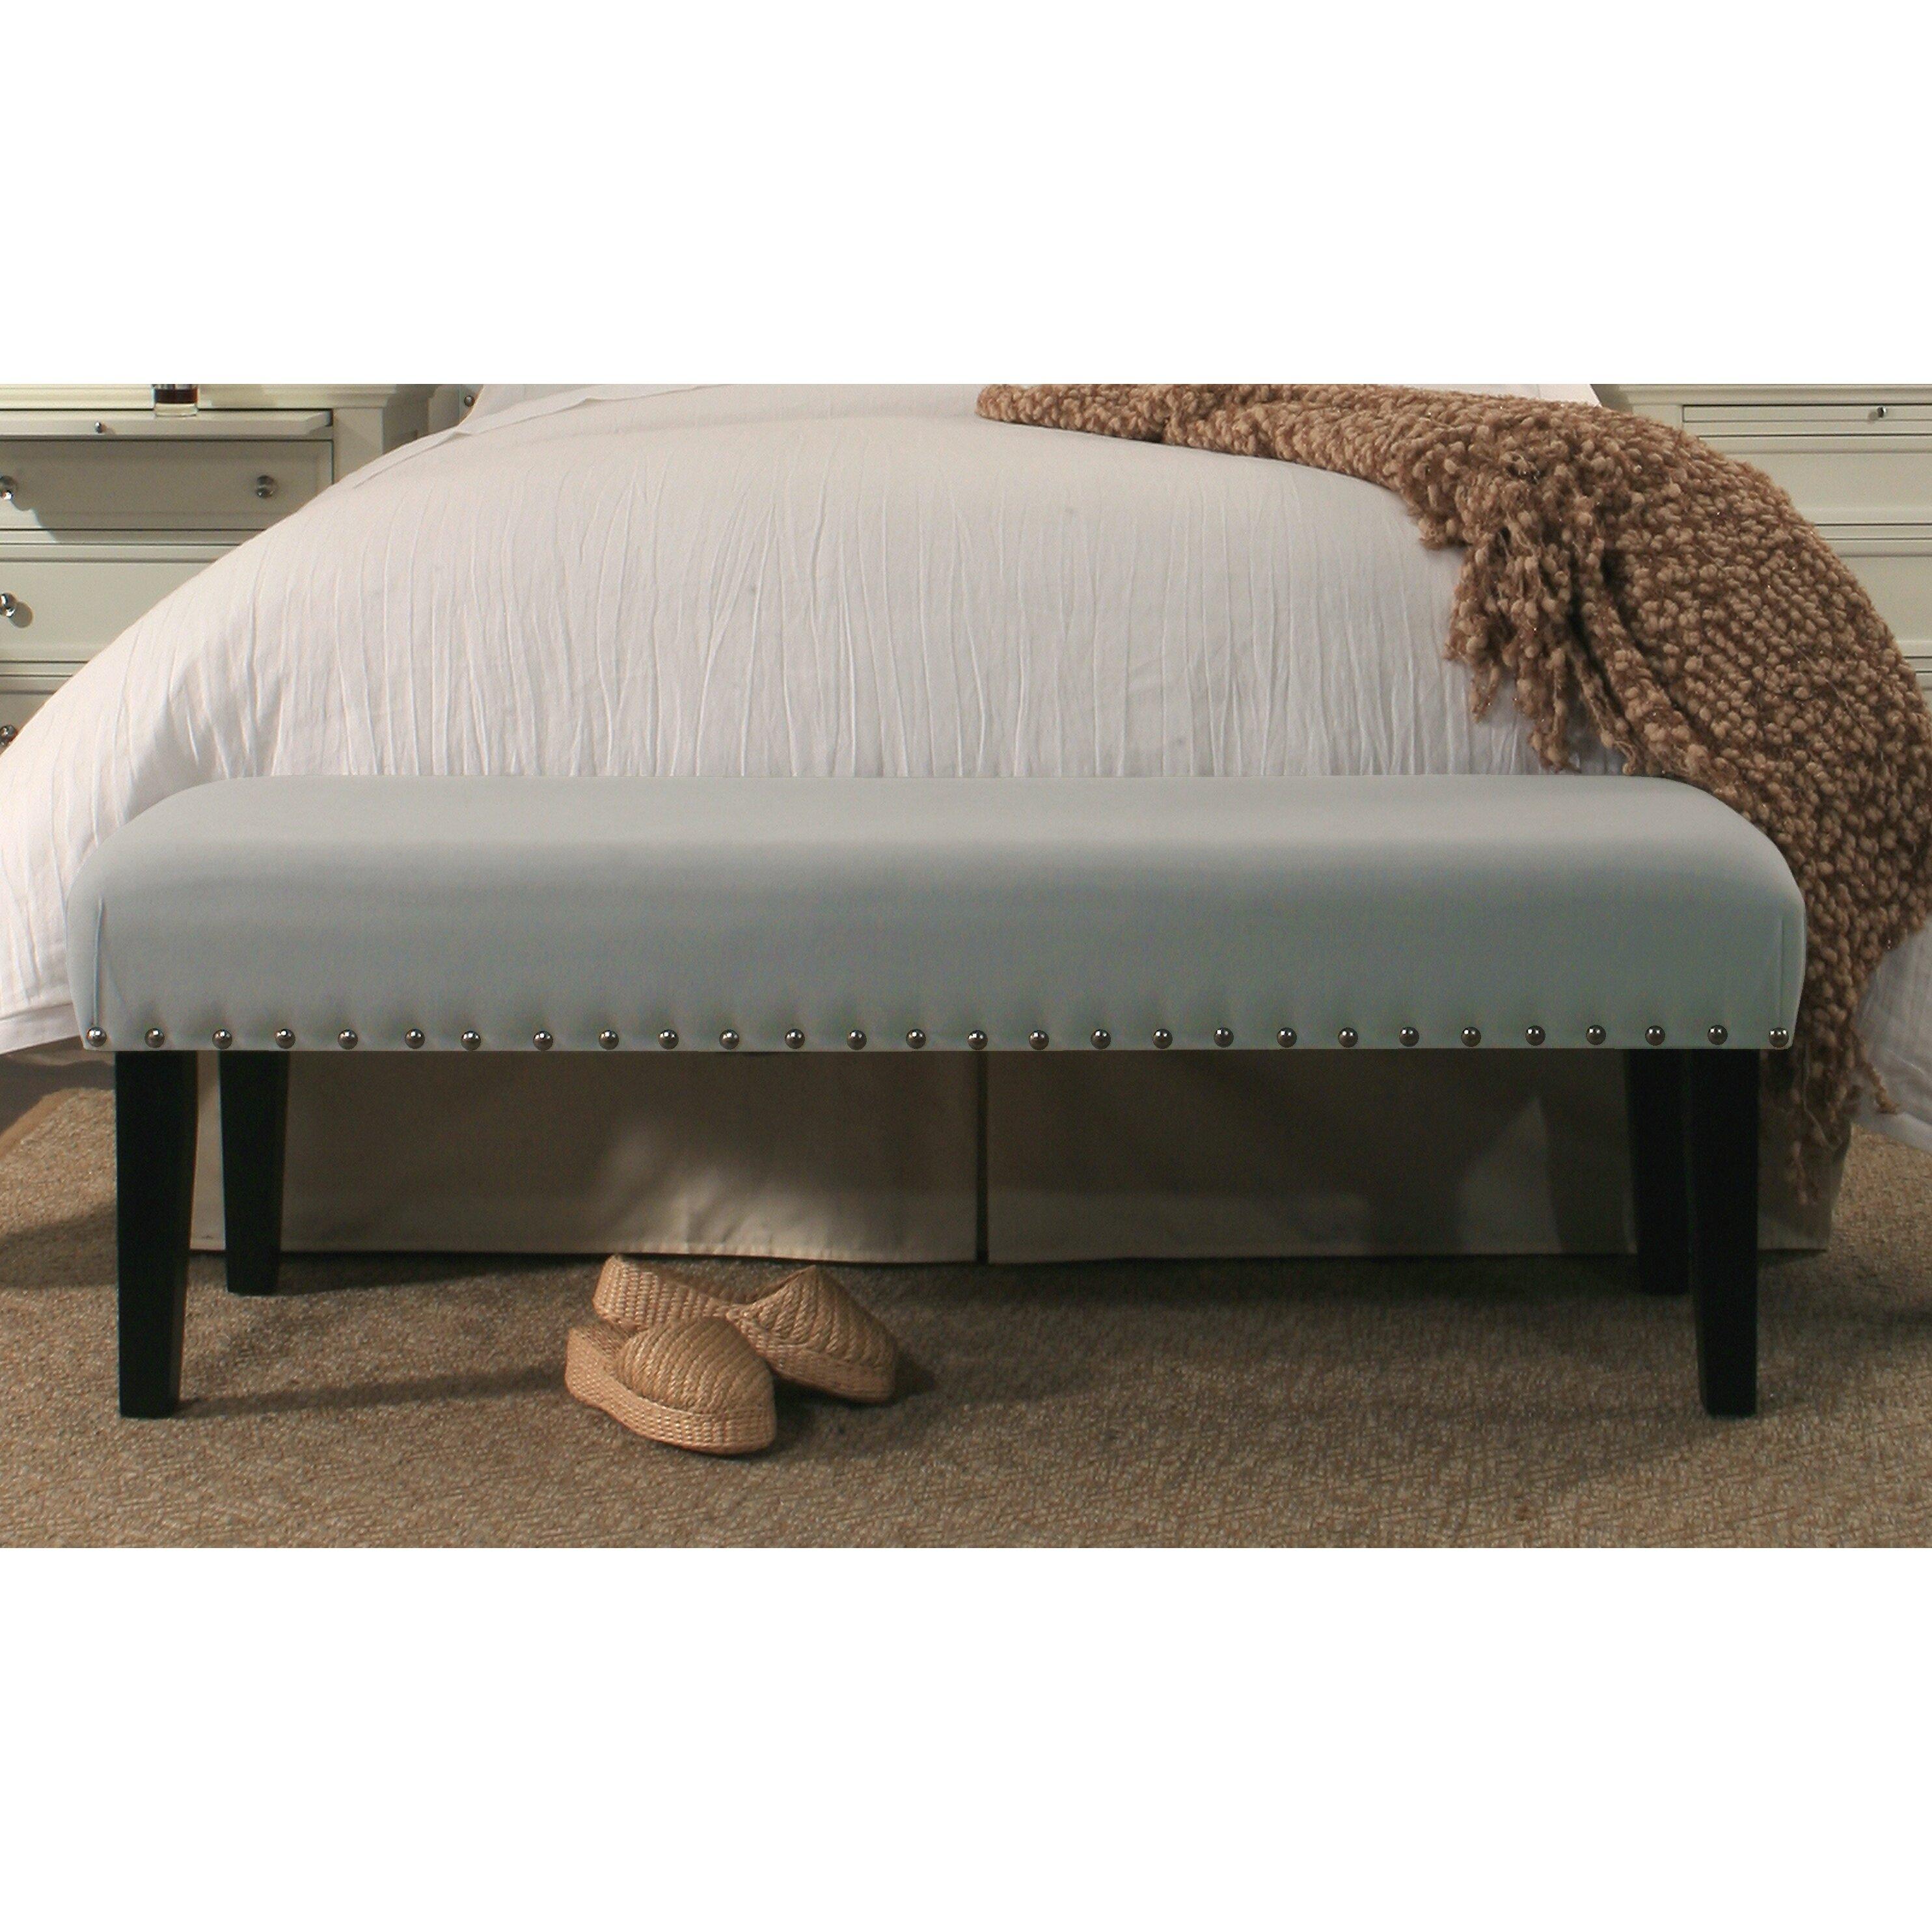 RepublicDesignHouse Inspirations Upholstered Bedroom Bench